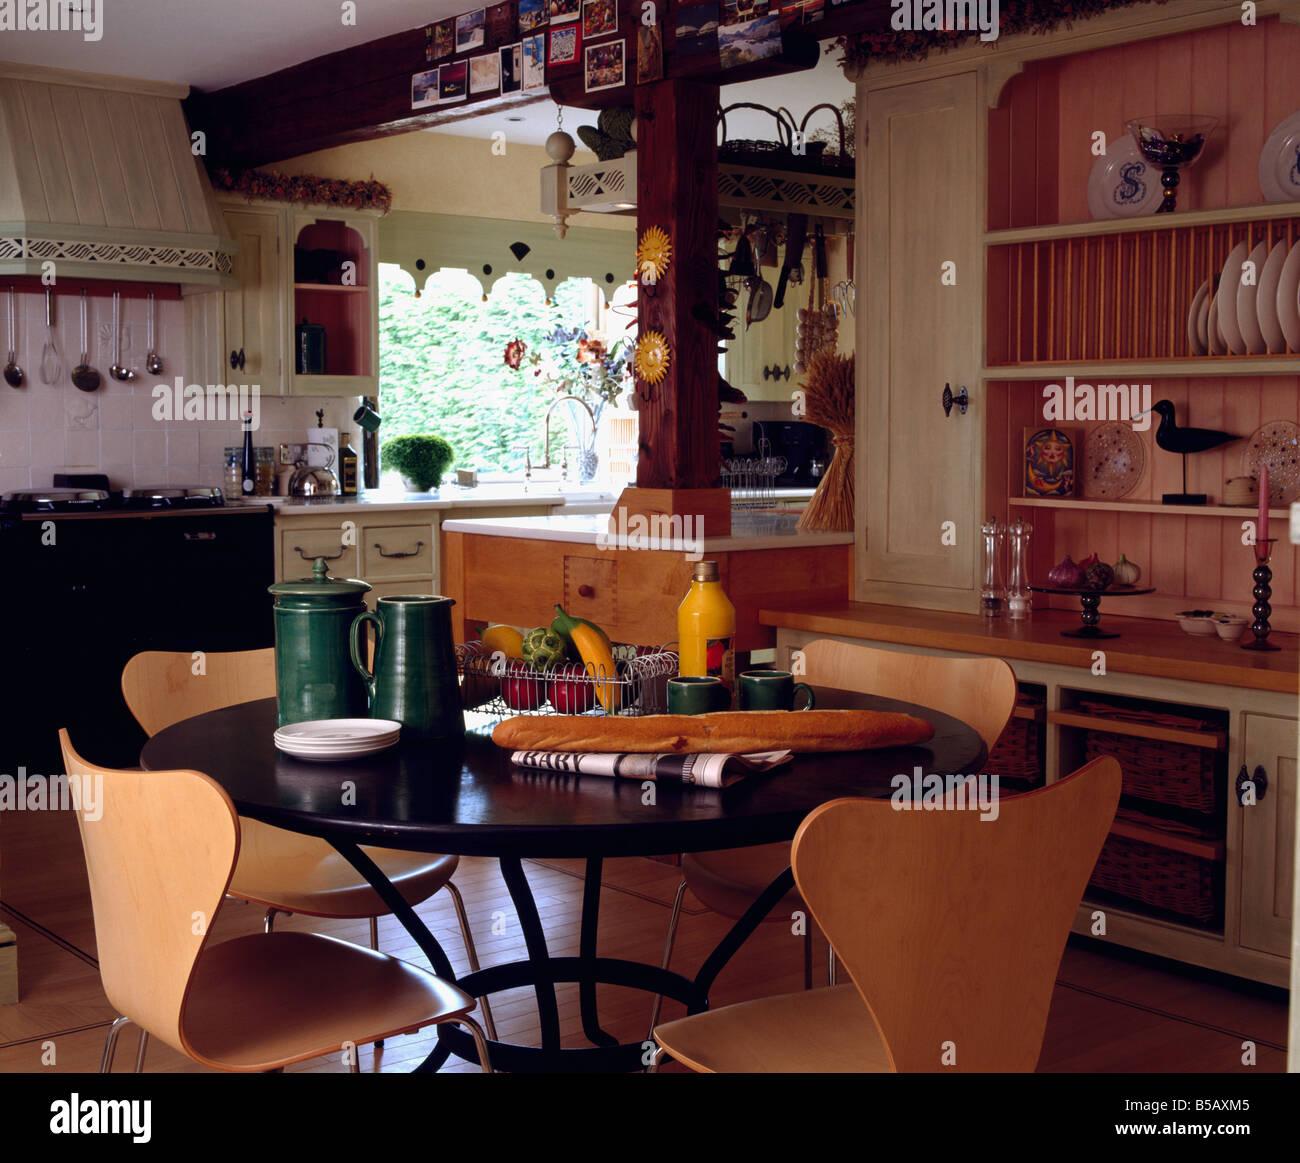 Furniture Chairs Openplan Stockfotos & Furniture Chairs Openplan ...